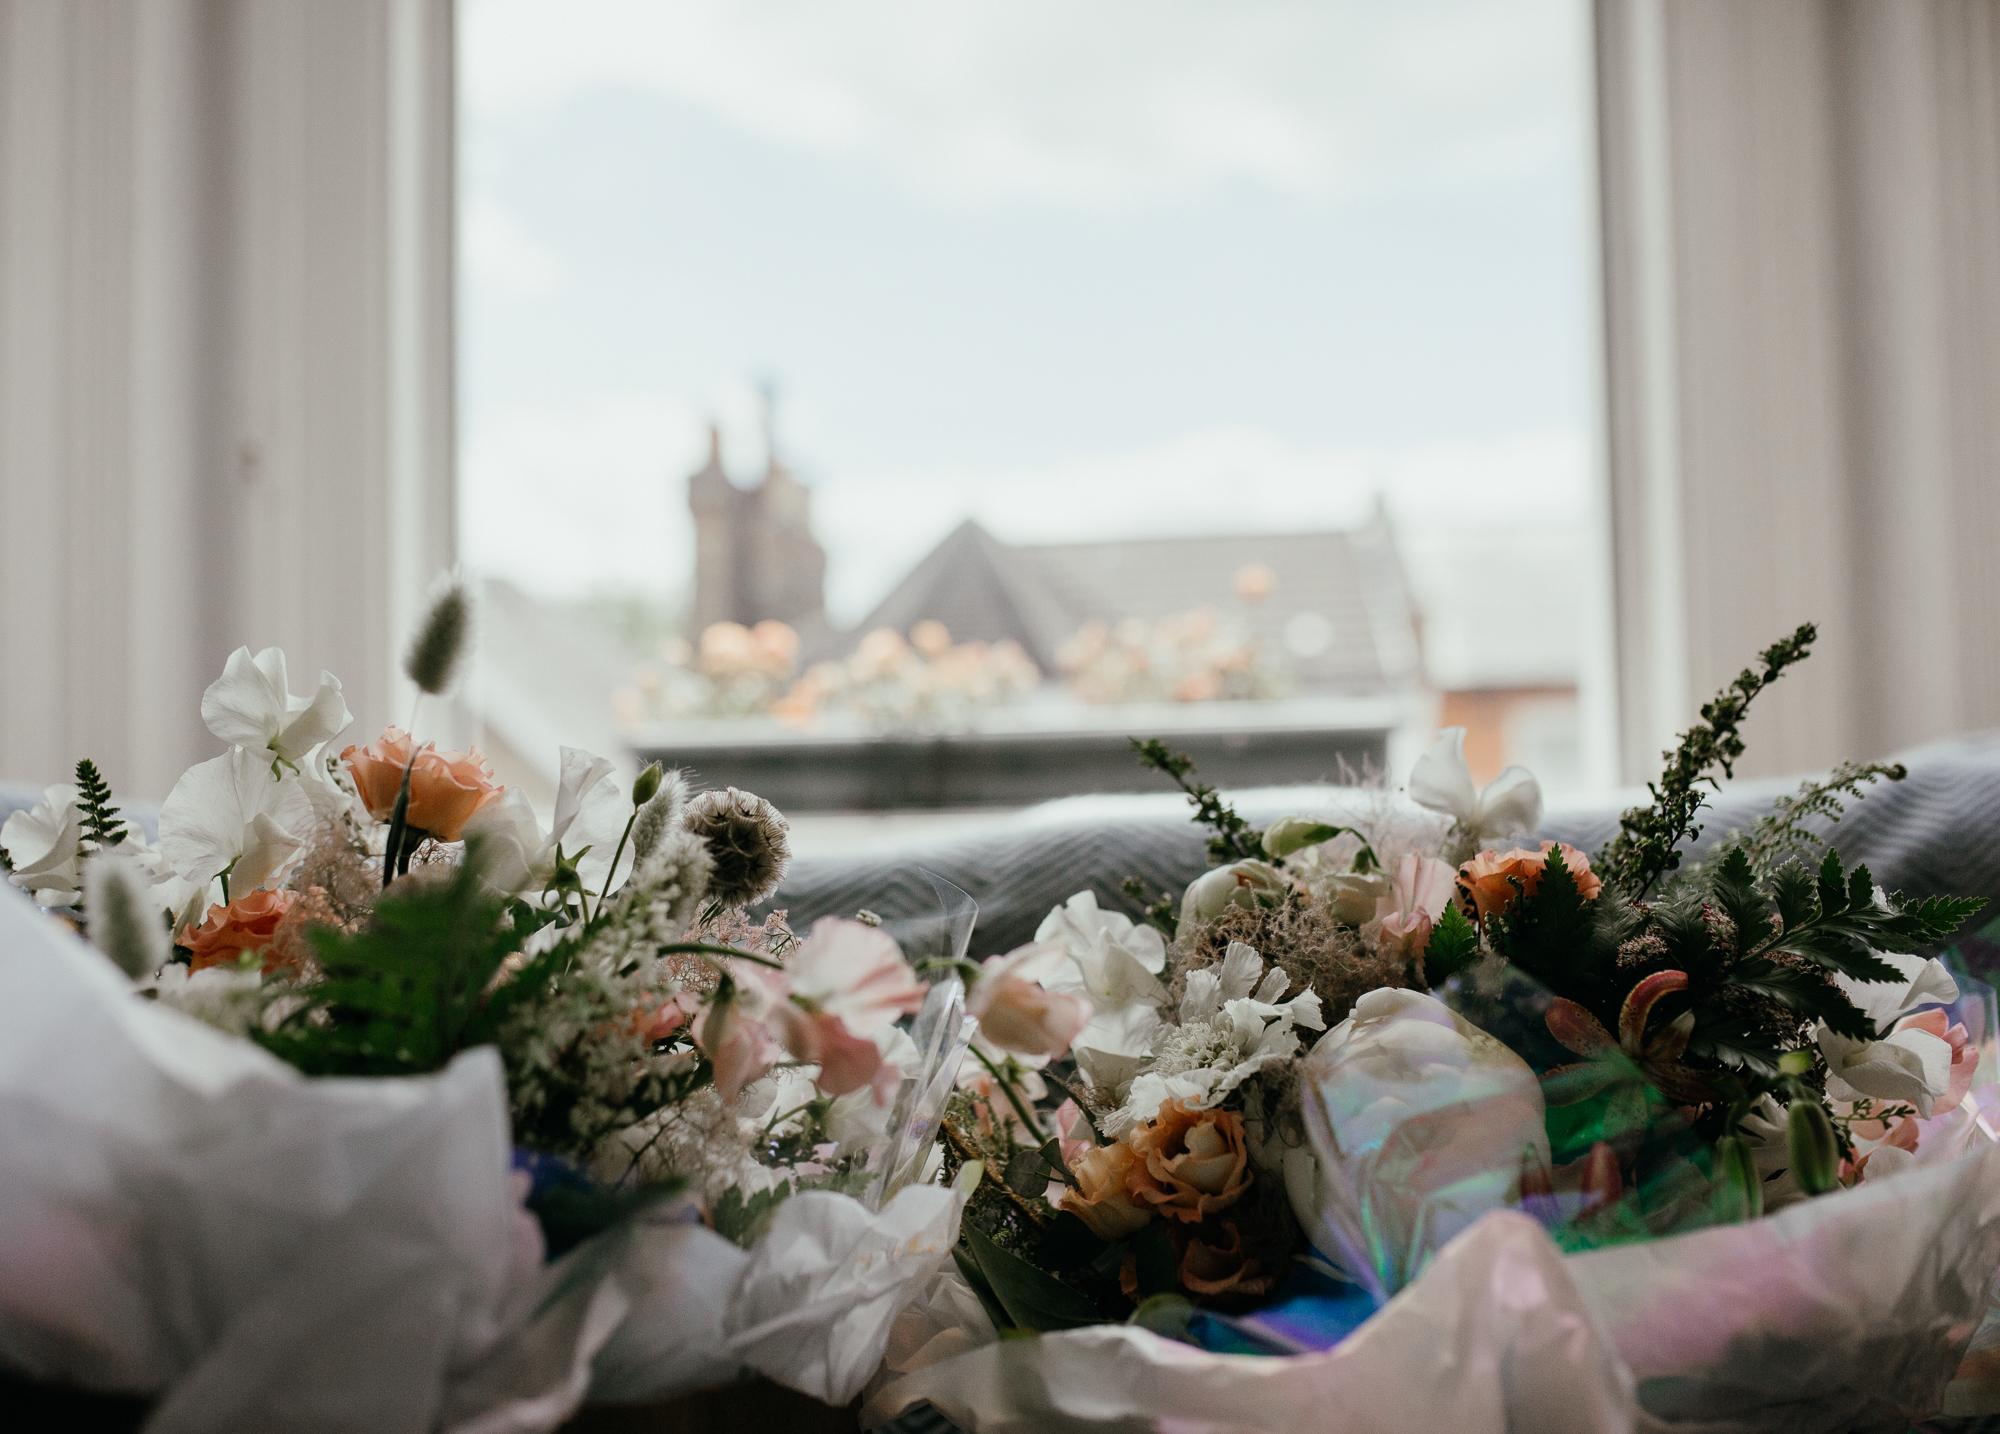 Nicebunch wedding flowers sula london-islington-town-hall-depot-n7 ethical british luxury bouquet bride bridesmaids stephanie-green-wedding-photography